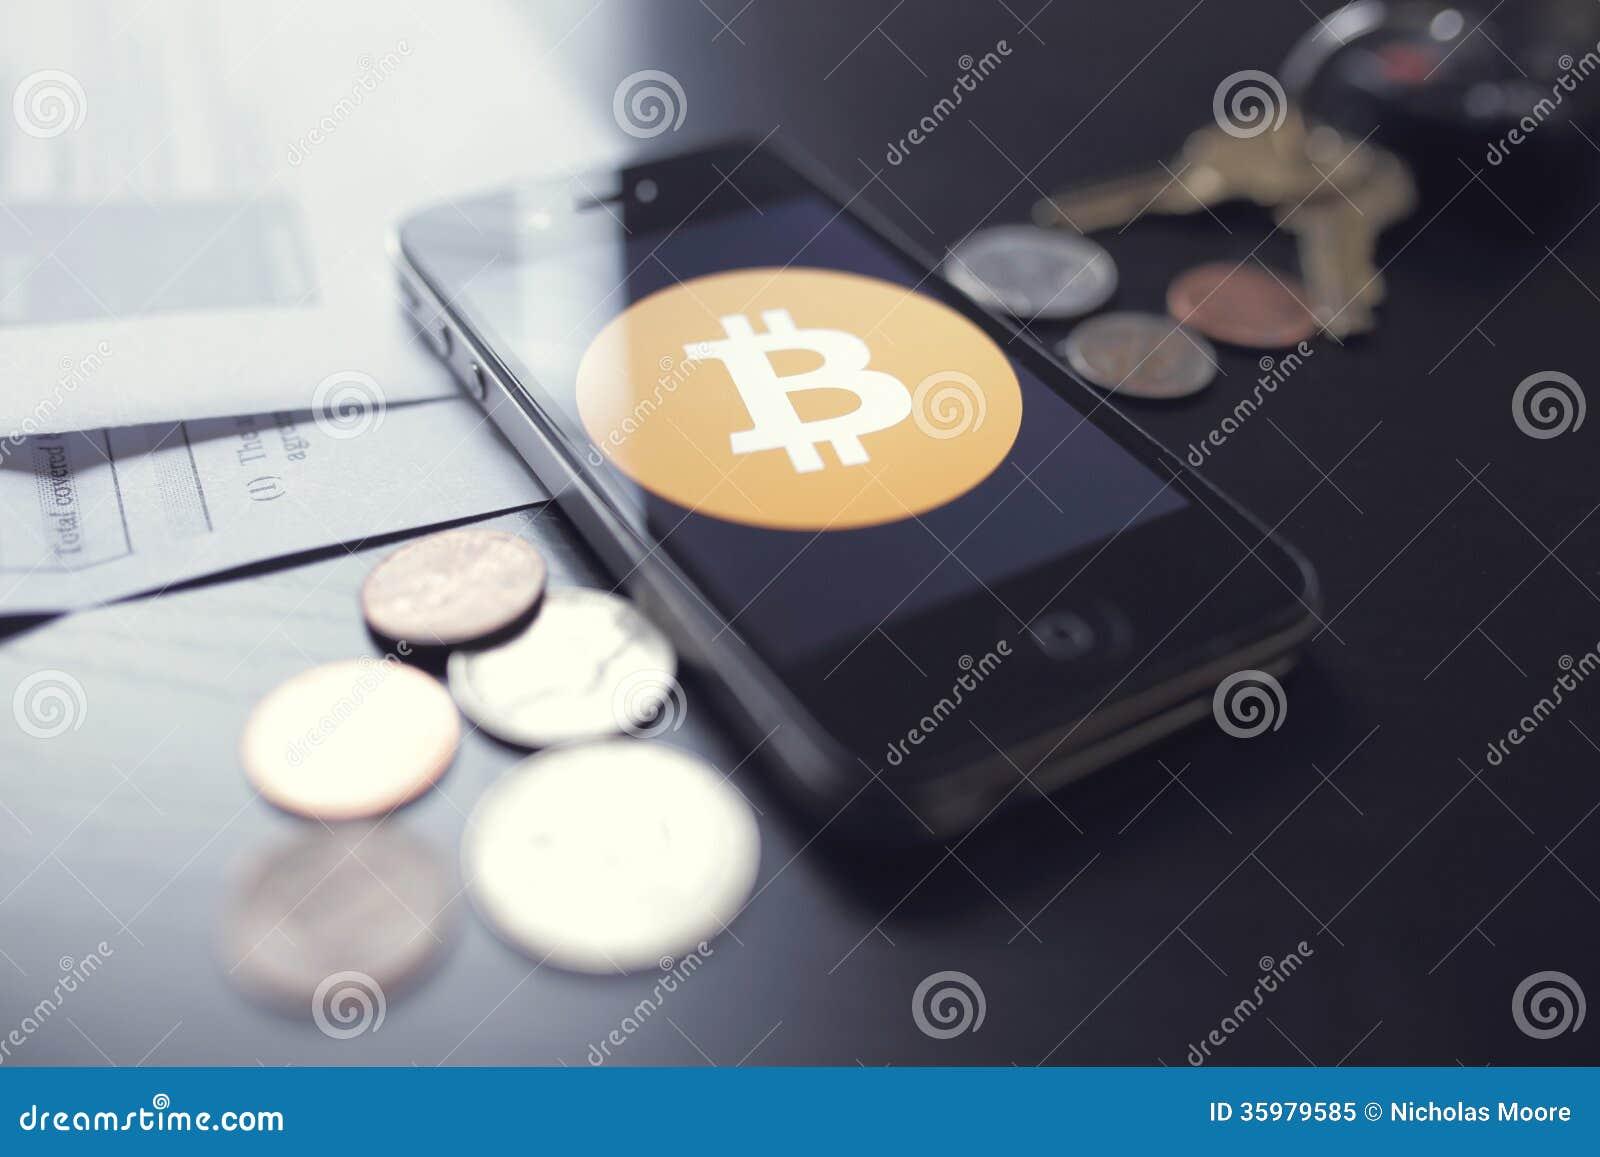 Bitcoin technologia z monetami